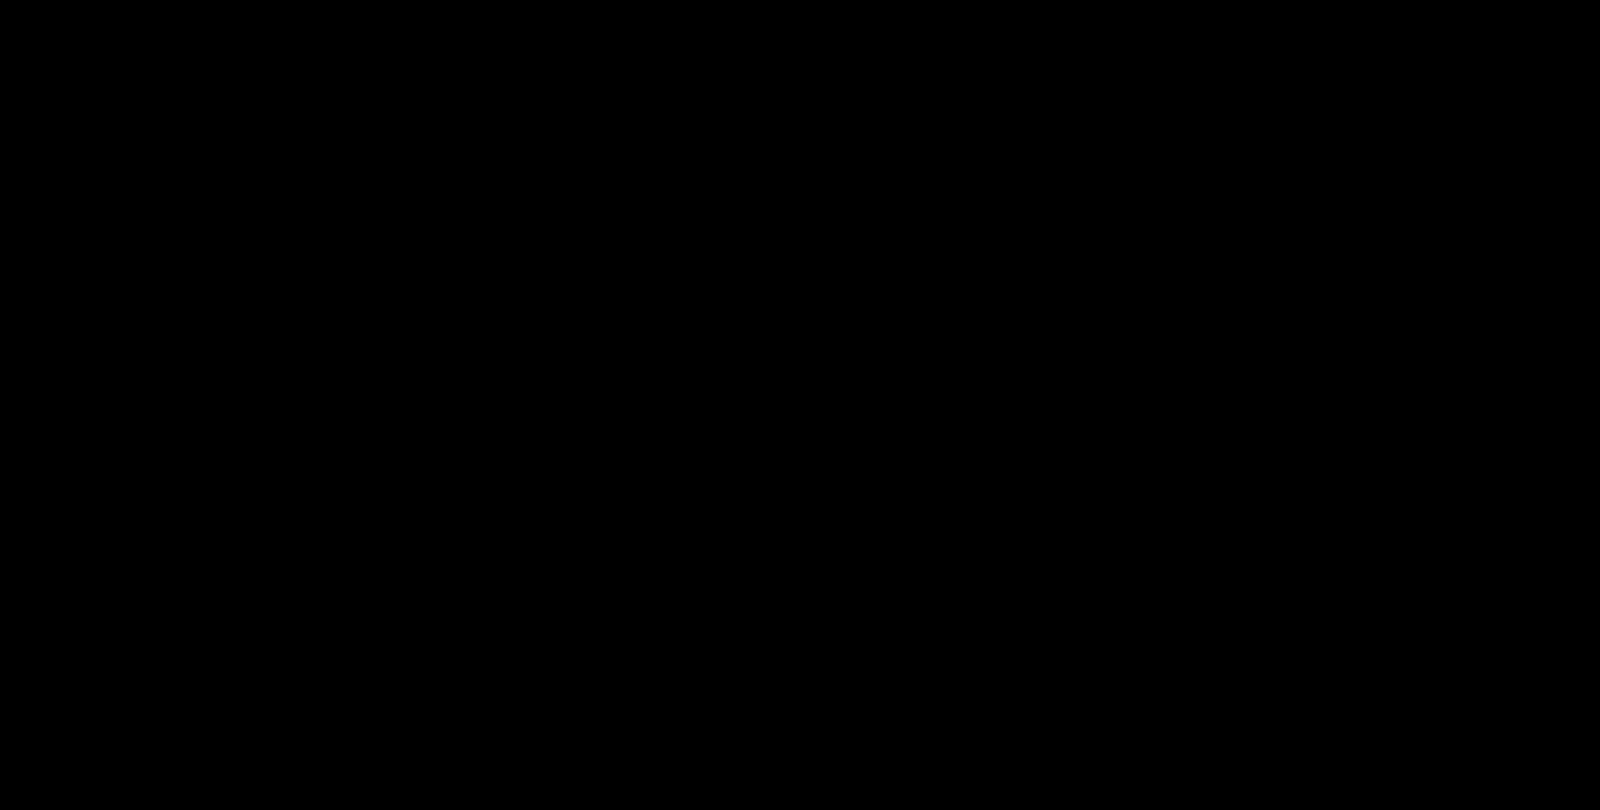 dsf_logo_uk_black_rgb.png